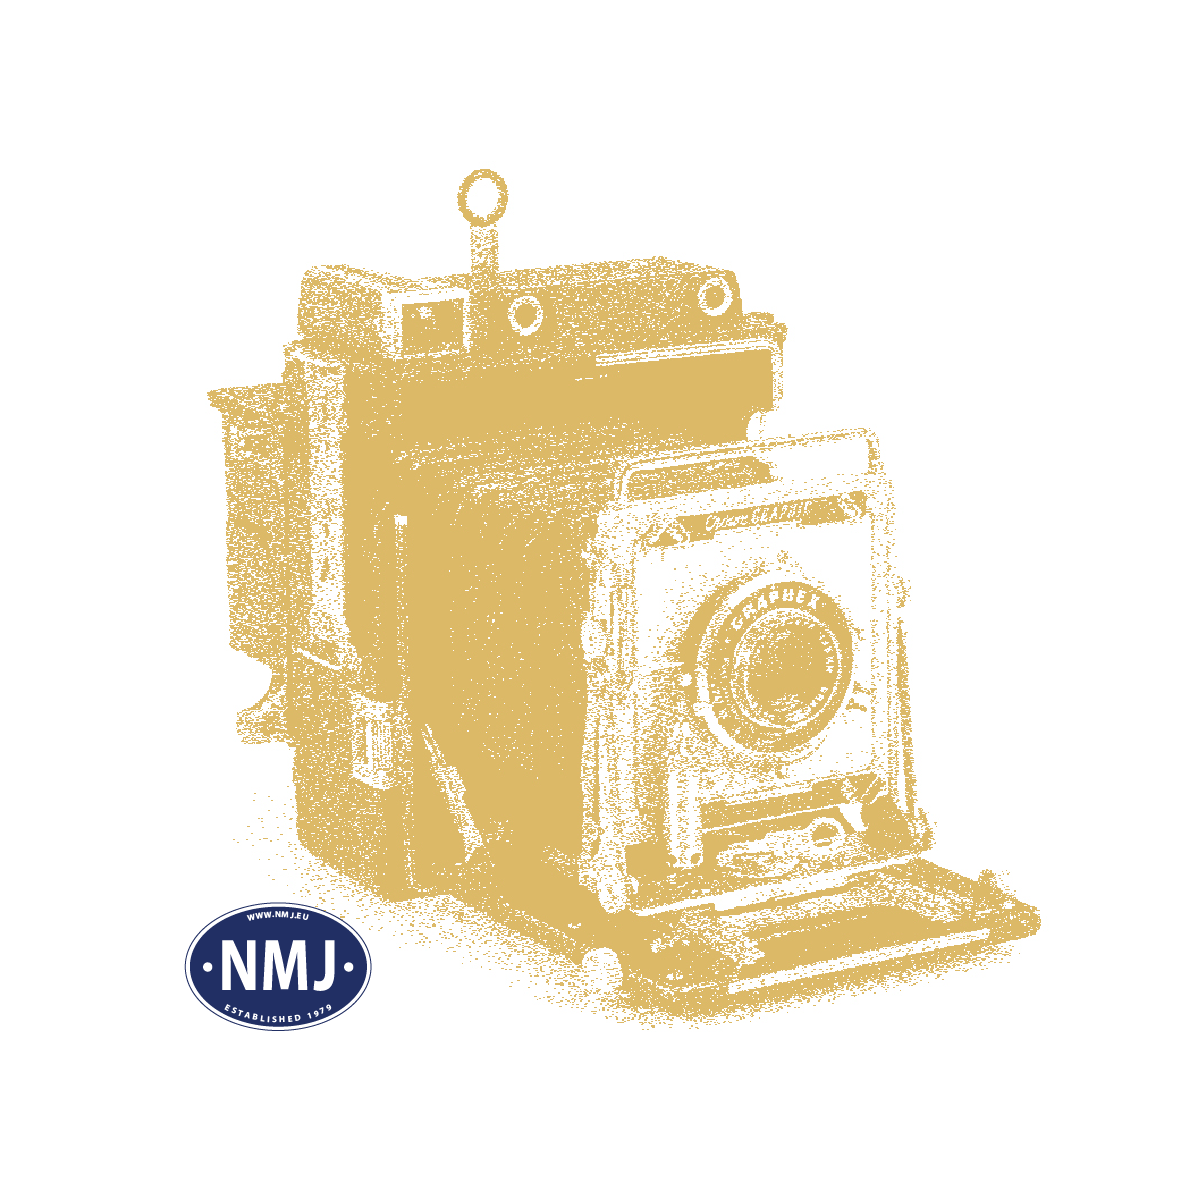 NMJT245001 - NMJ Topline NSB Di3b 641, Red/Brown Livery, 0-Skale, DCC w/ Sound